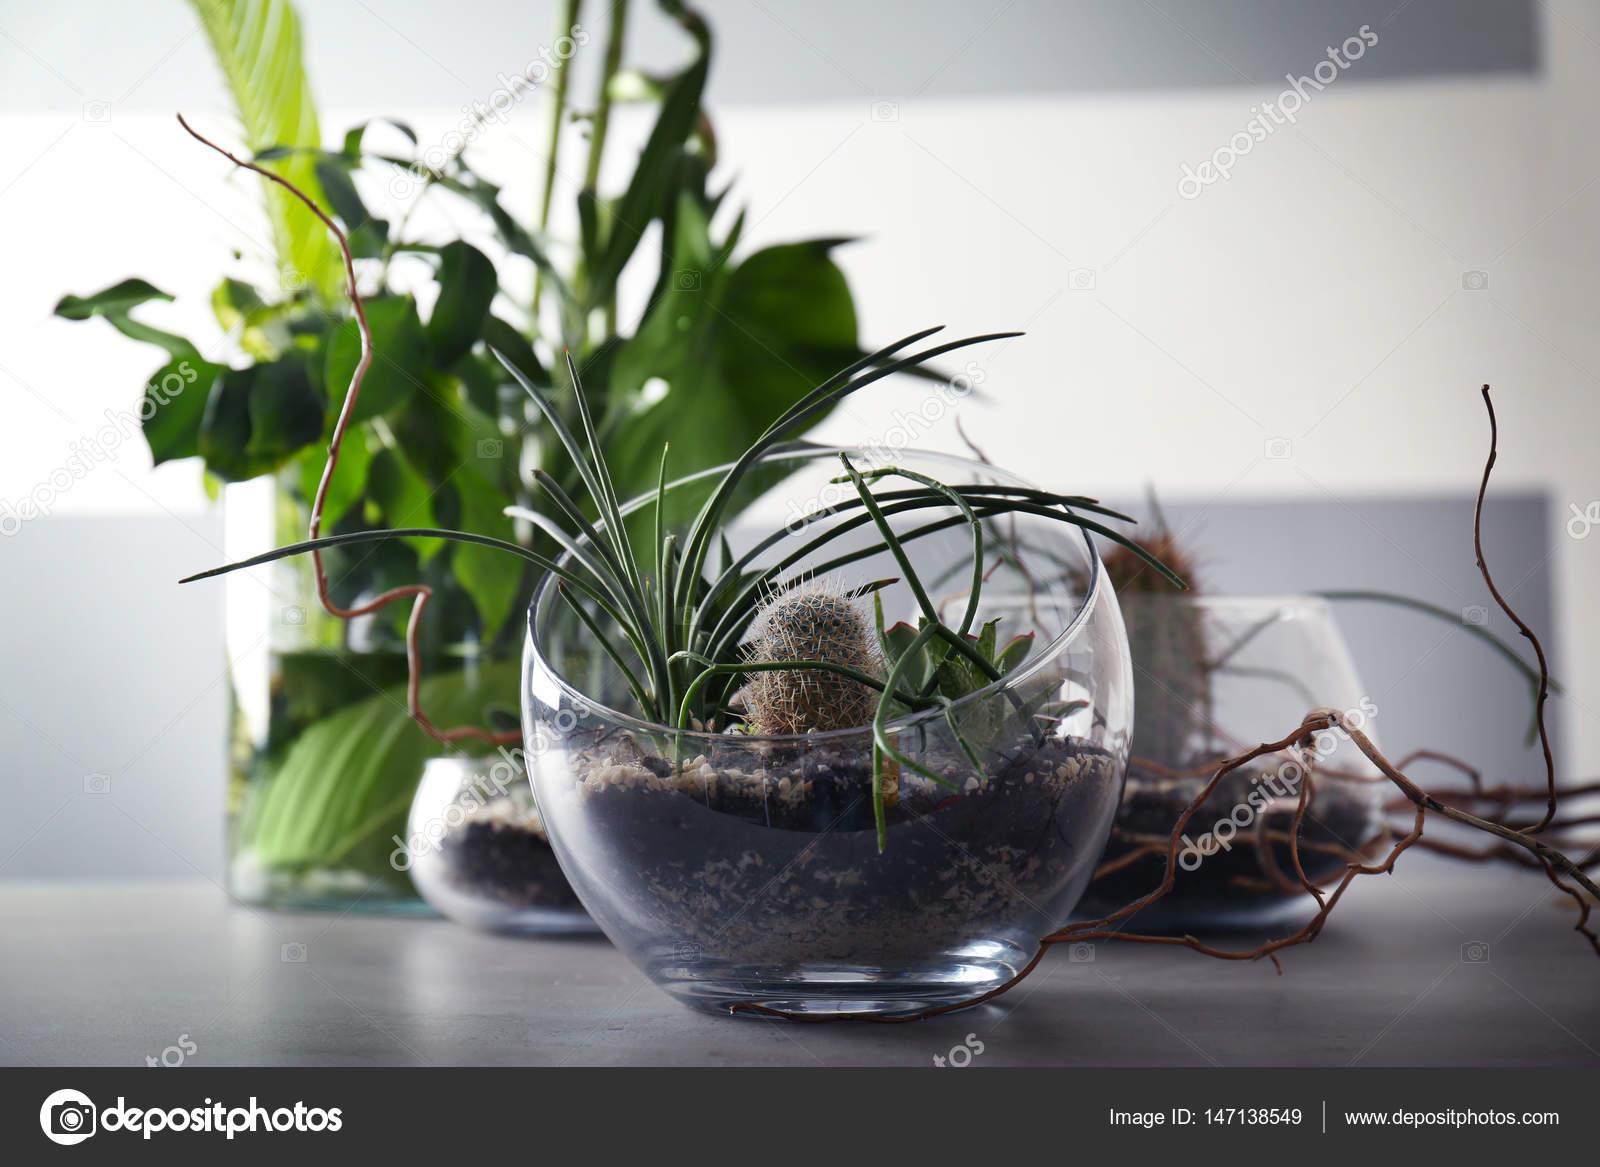 Piante Grasse In Vetro.Florarium In Vasi Di Vetro Con Piante Grasse Foto Stock